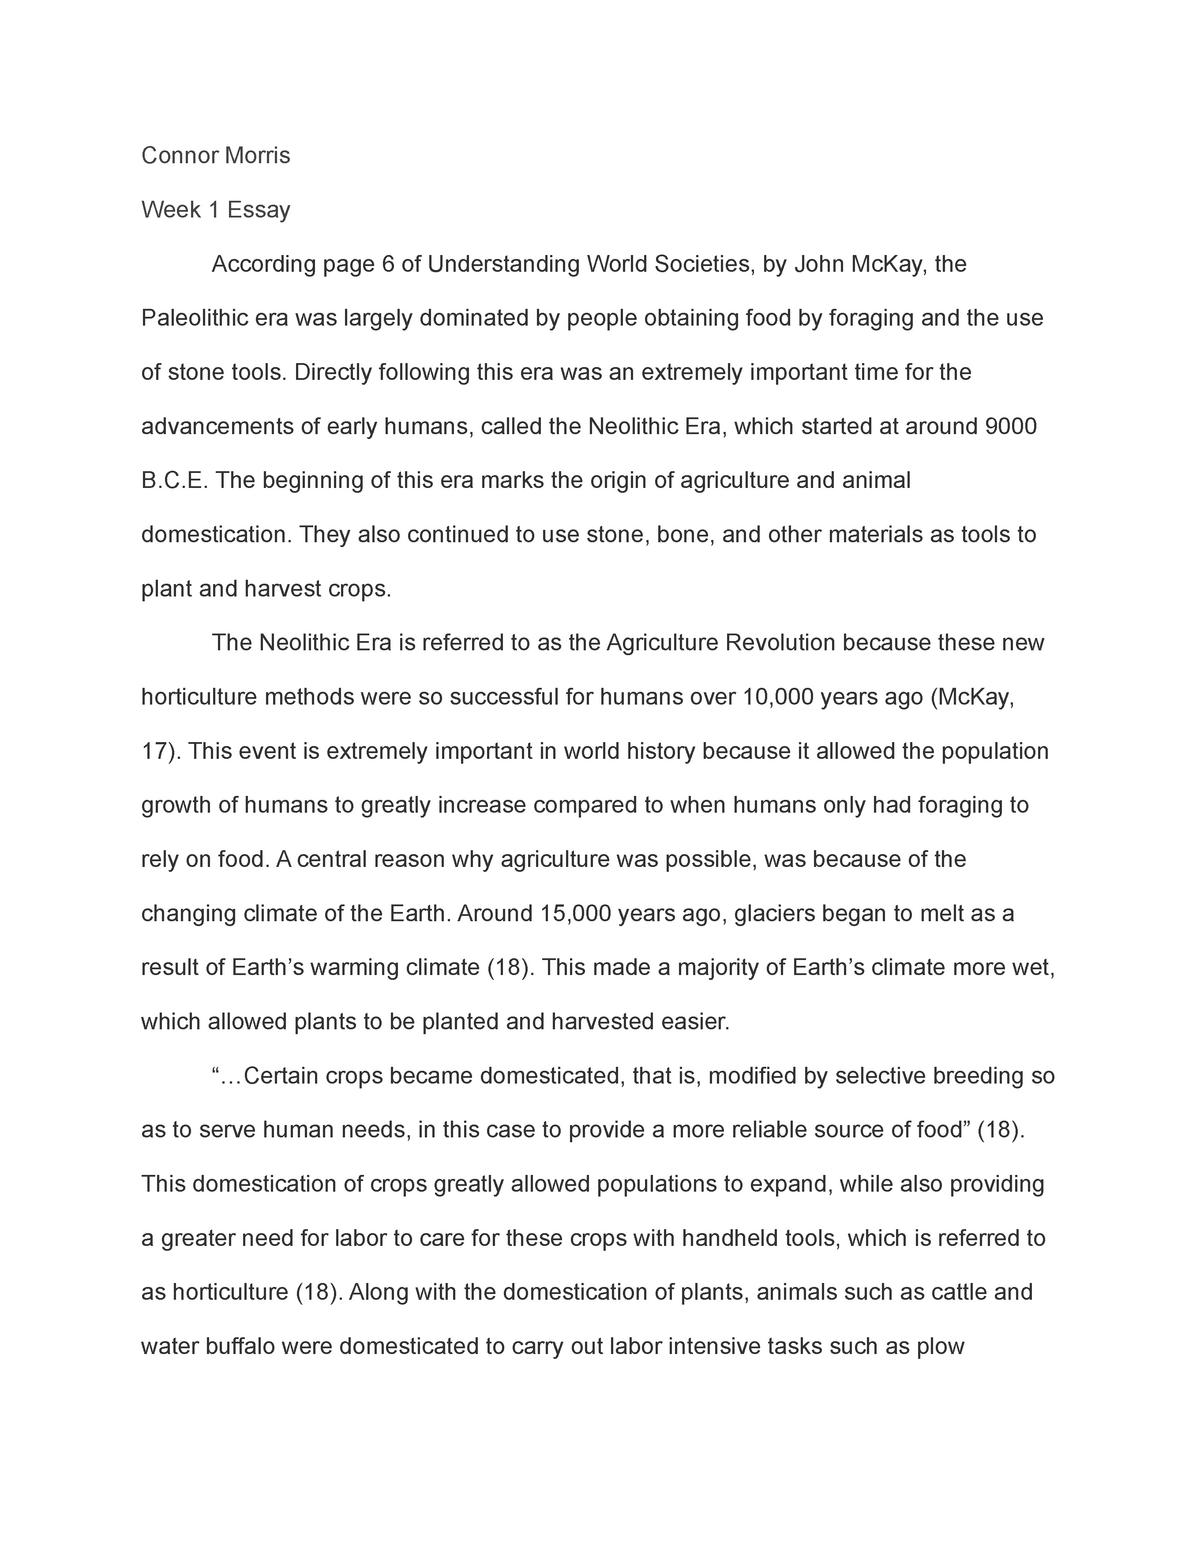 Week 1 essay - Grade: a - HIST 1010 World Civilizations II